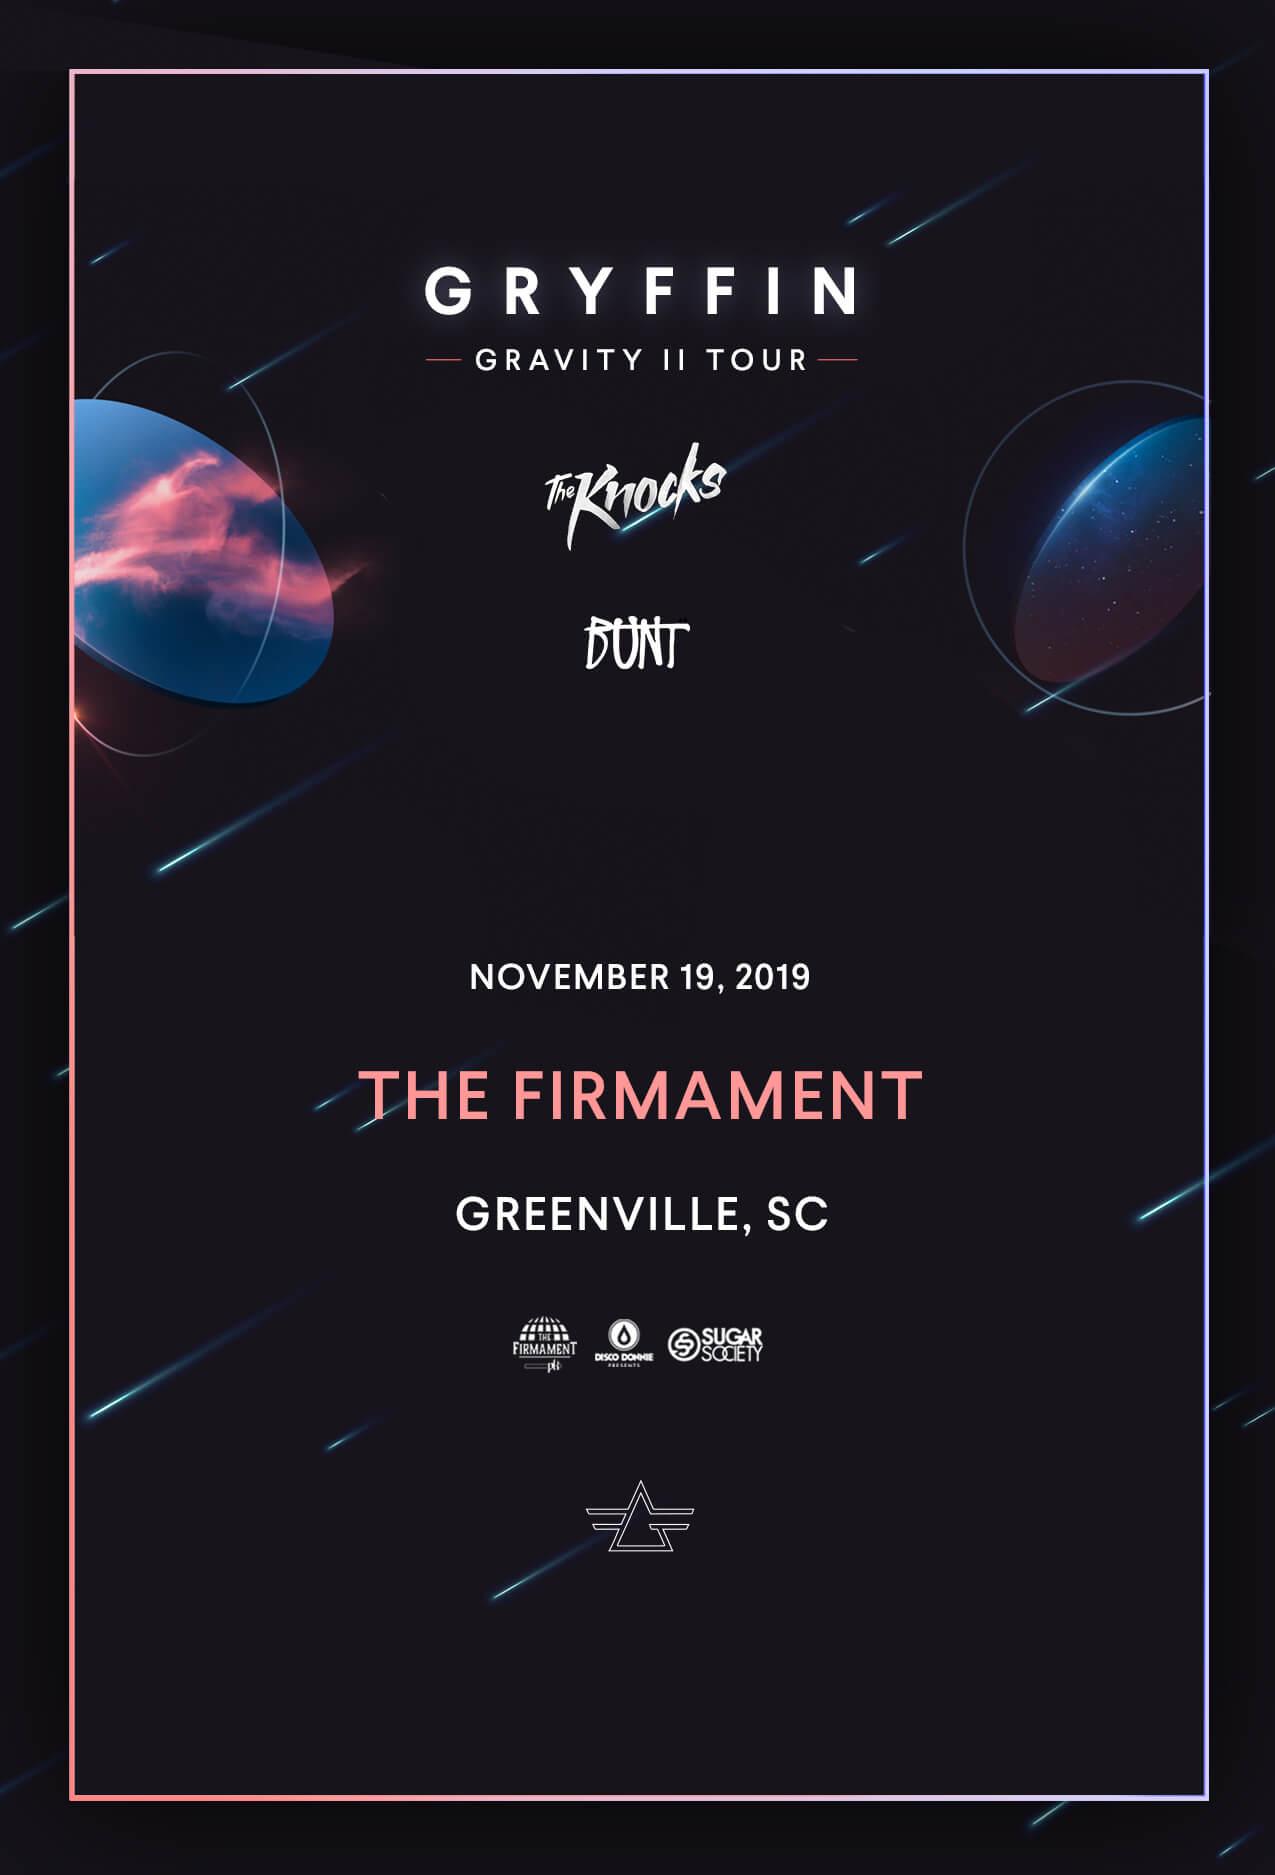 Gryffin, The Knocks, BUNT in Greenville